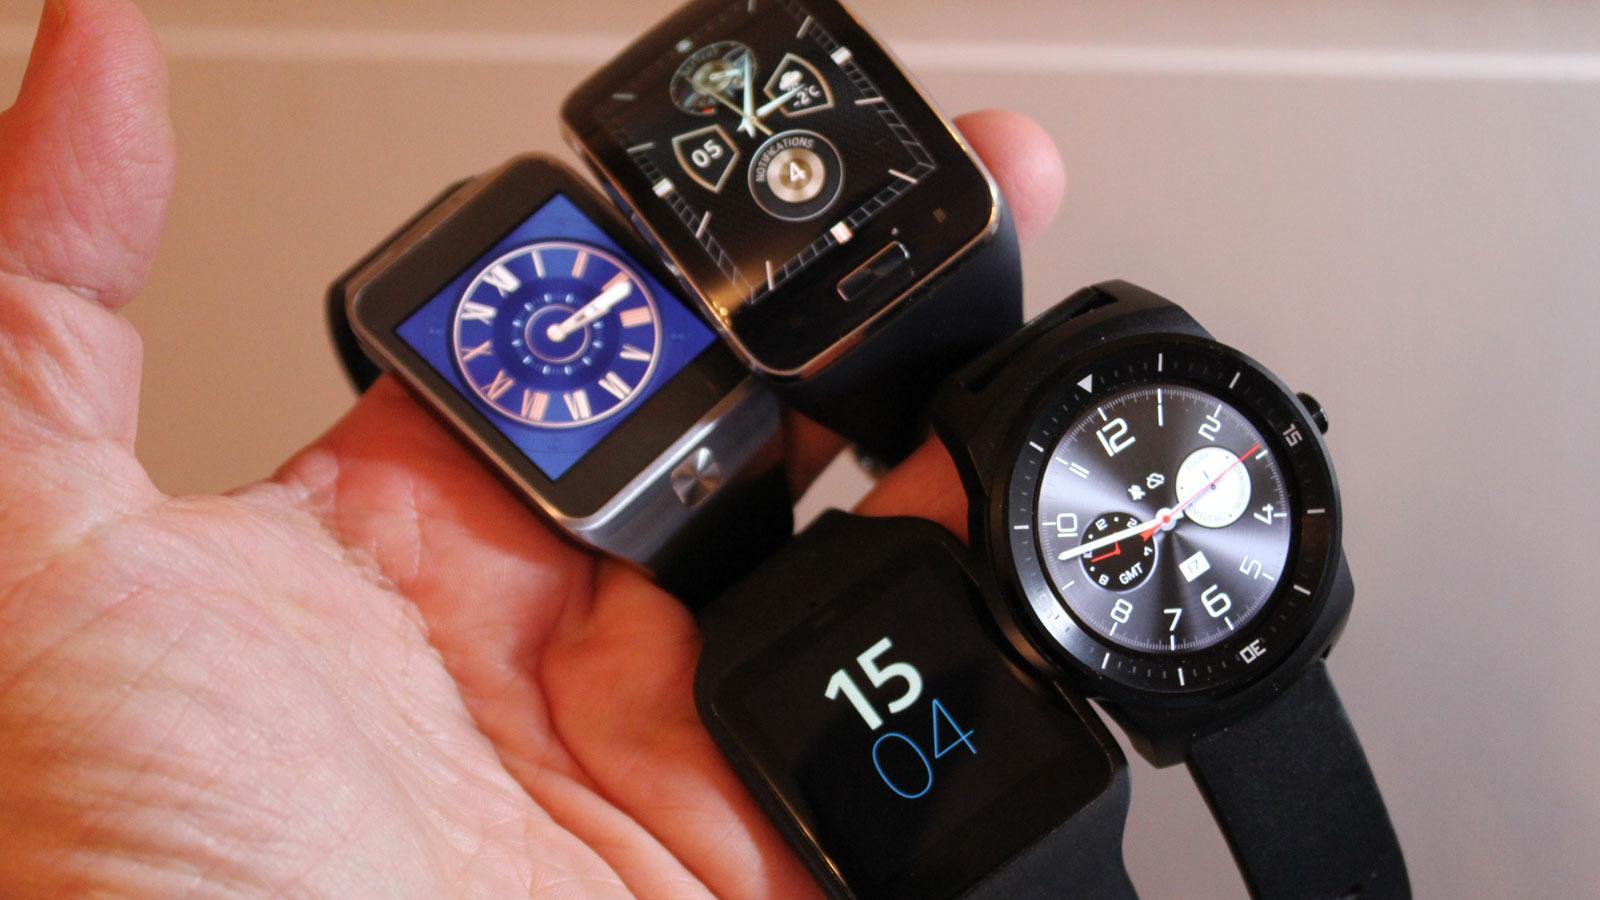 Her er Sony Smartwatch 4 og de tre hissigste konkurrentene. Øverst de to Samsungmodellene, nederst Sony SmartWatch 3 og LGs runde G Watch R.Foto: Espen Irwing Swang, Tek.no